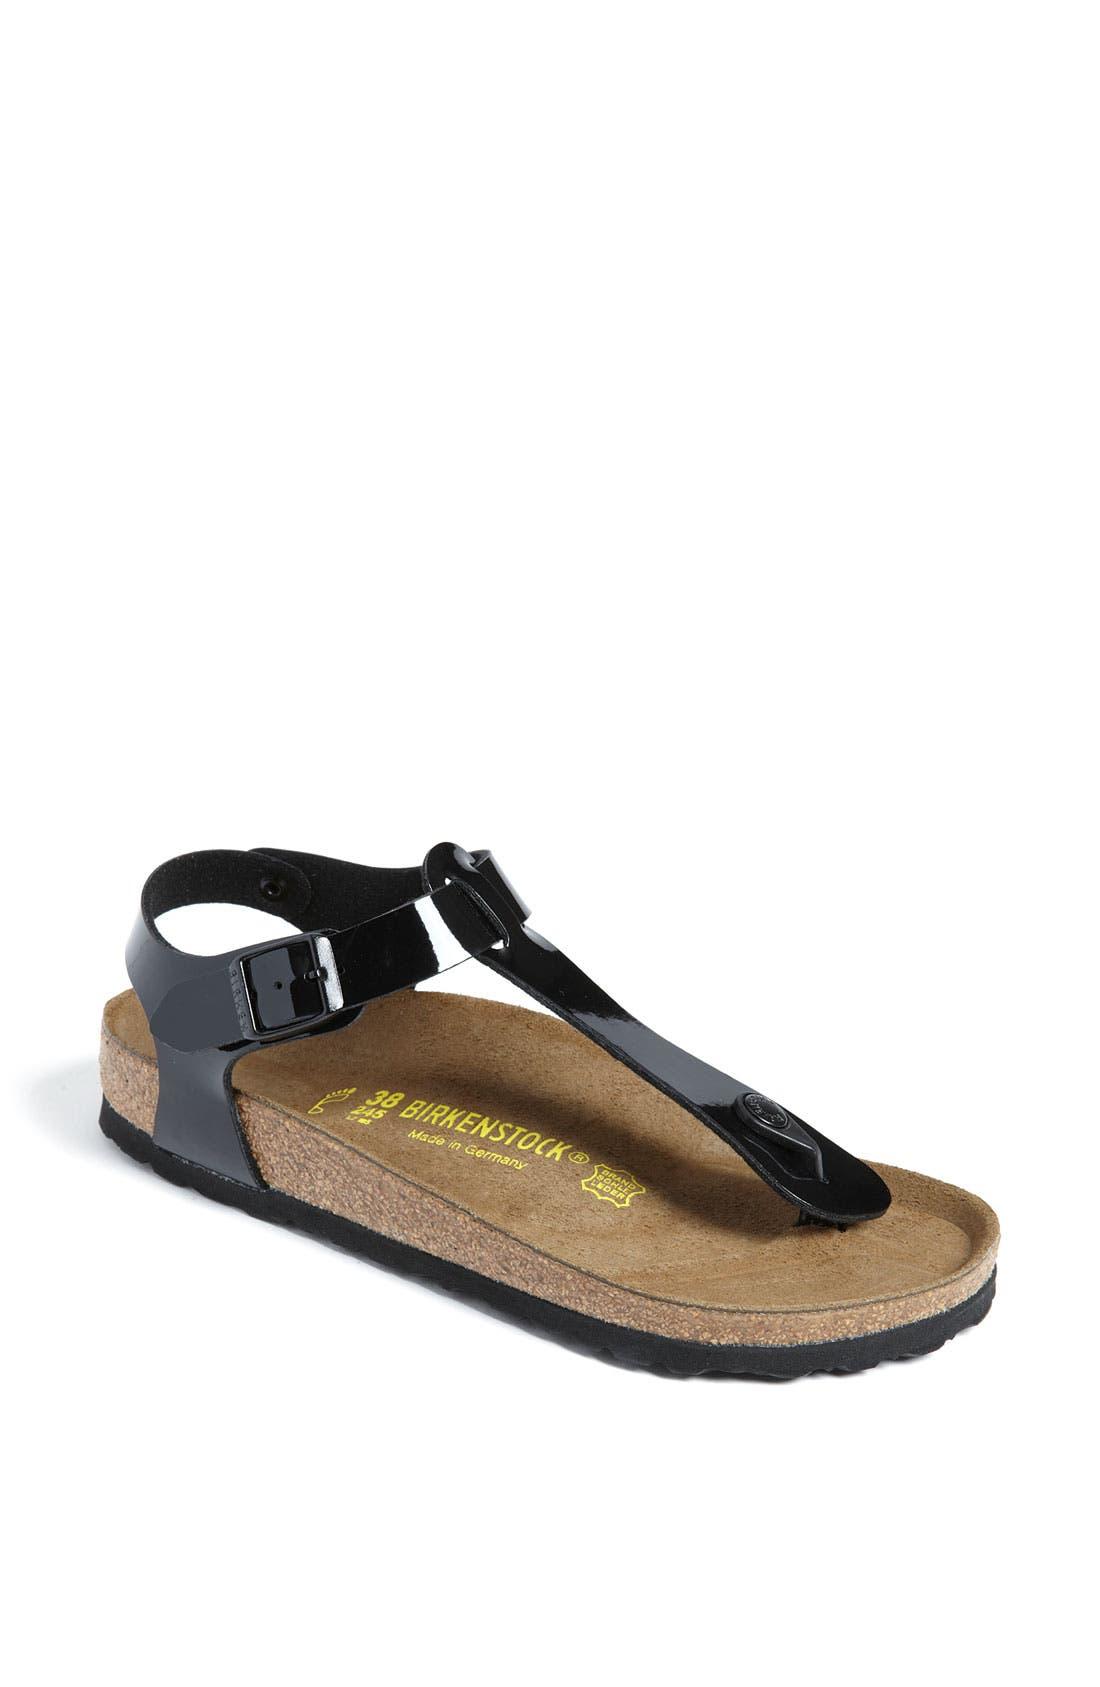 Main Image - Birkenstock 'Kairo' Birko-Flor™ Sandal (Women)